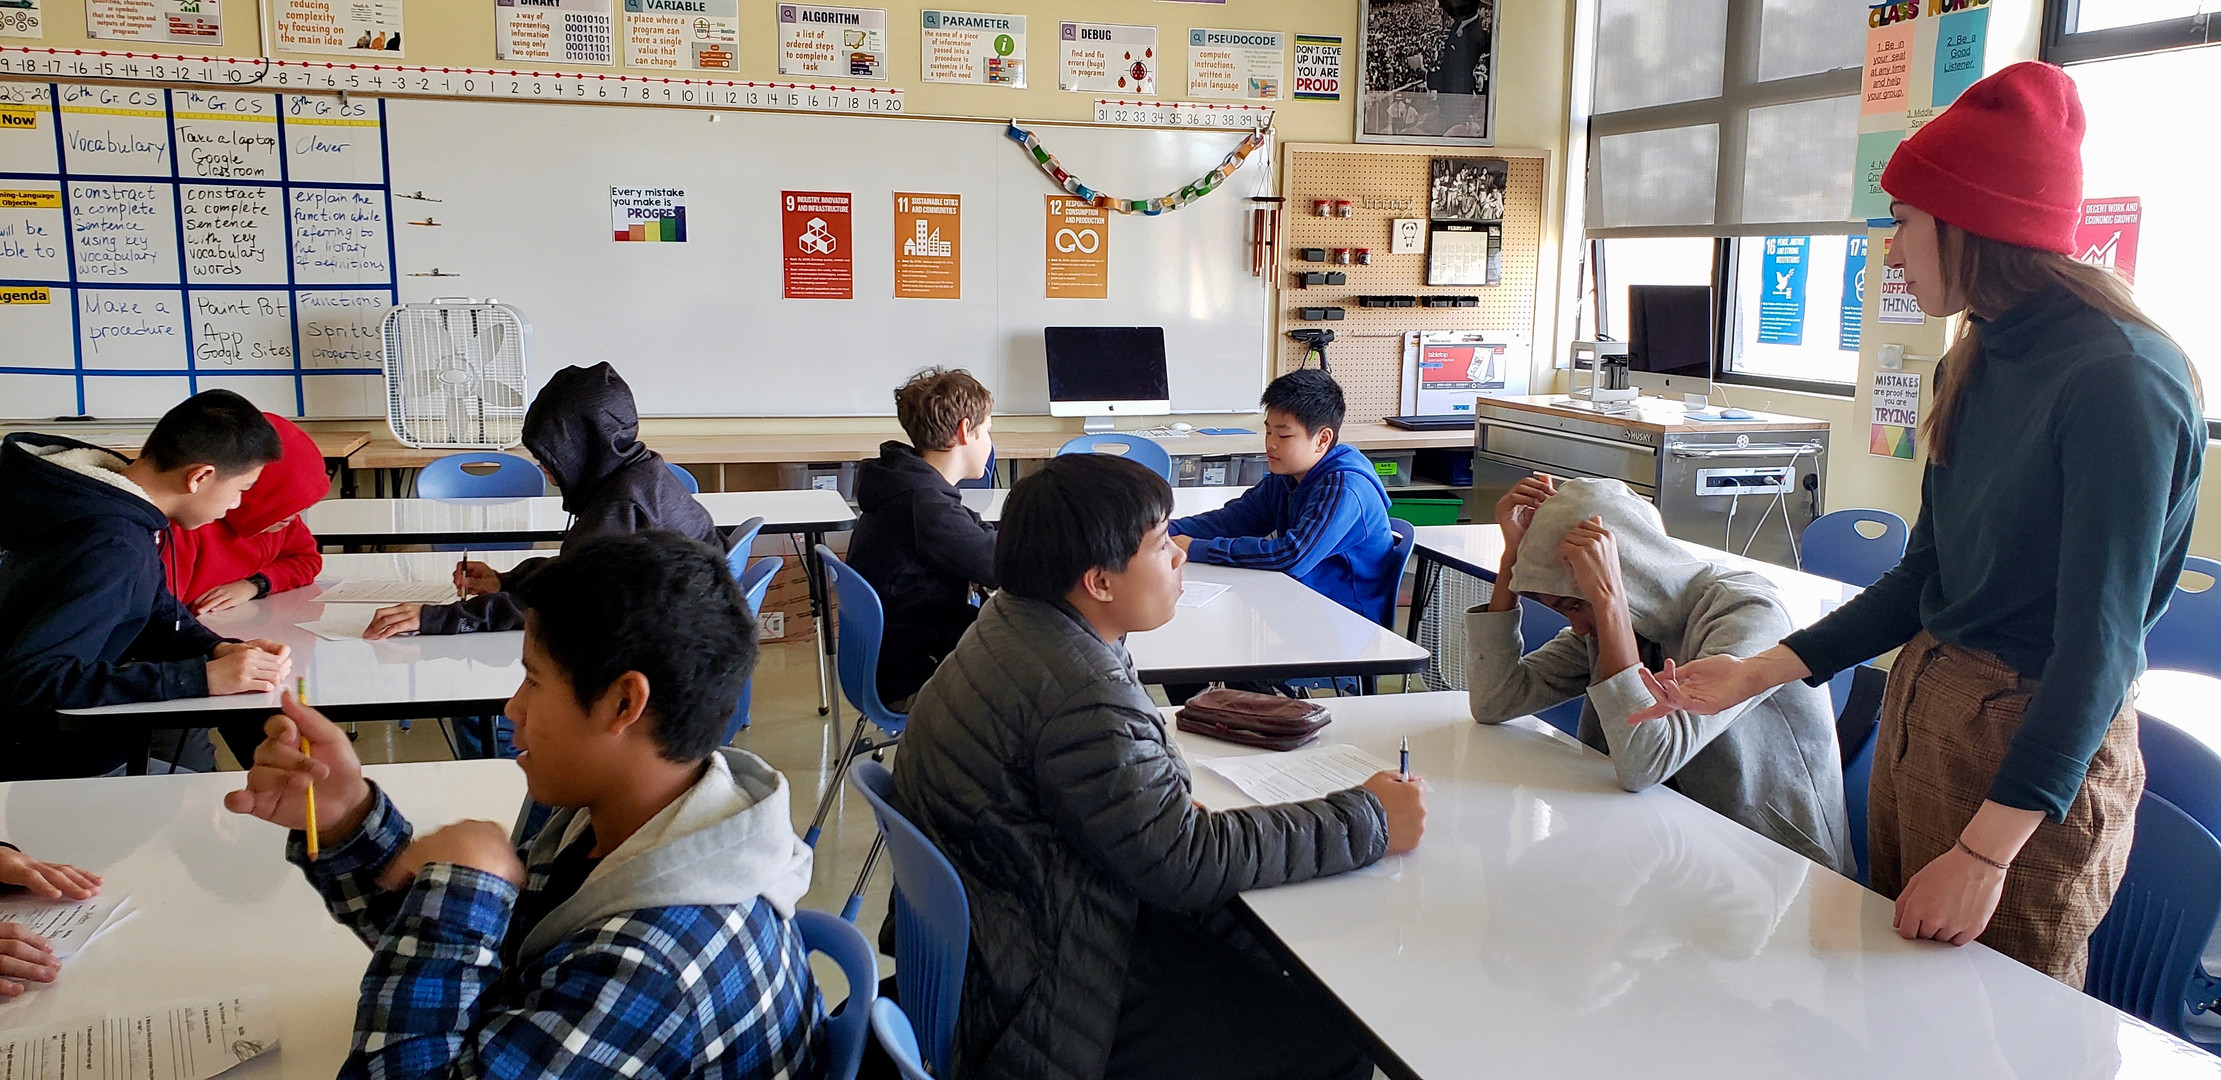 SFFILMClassroom (1).jpeg